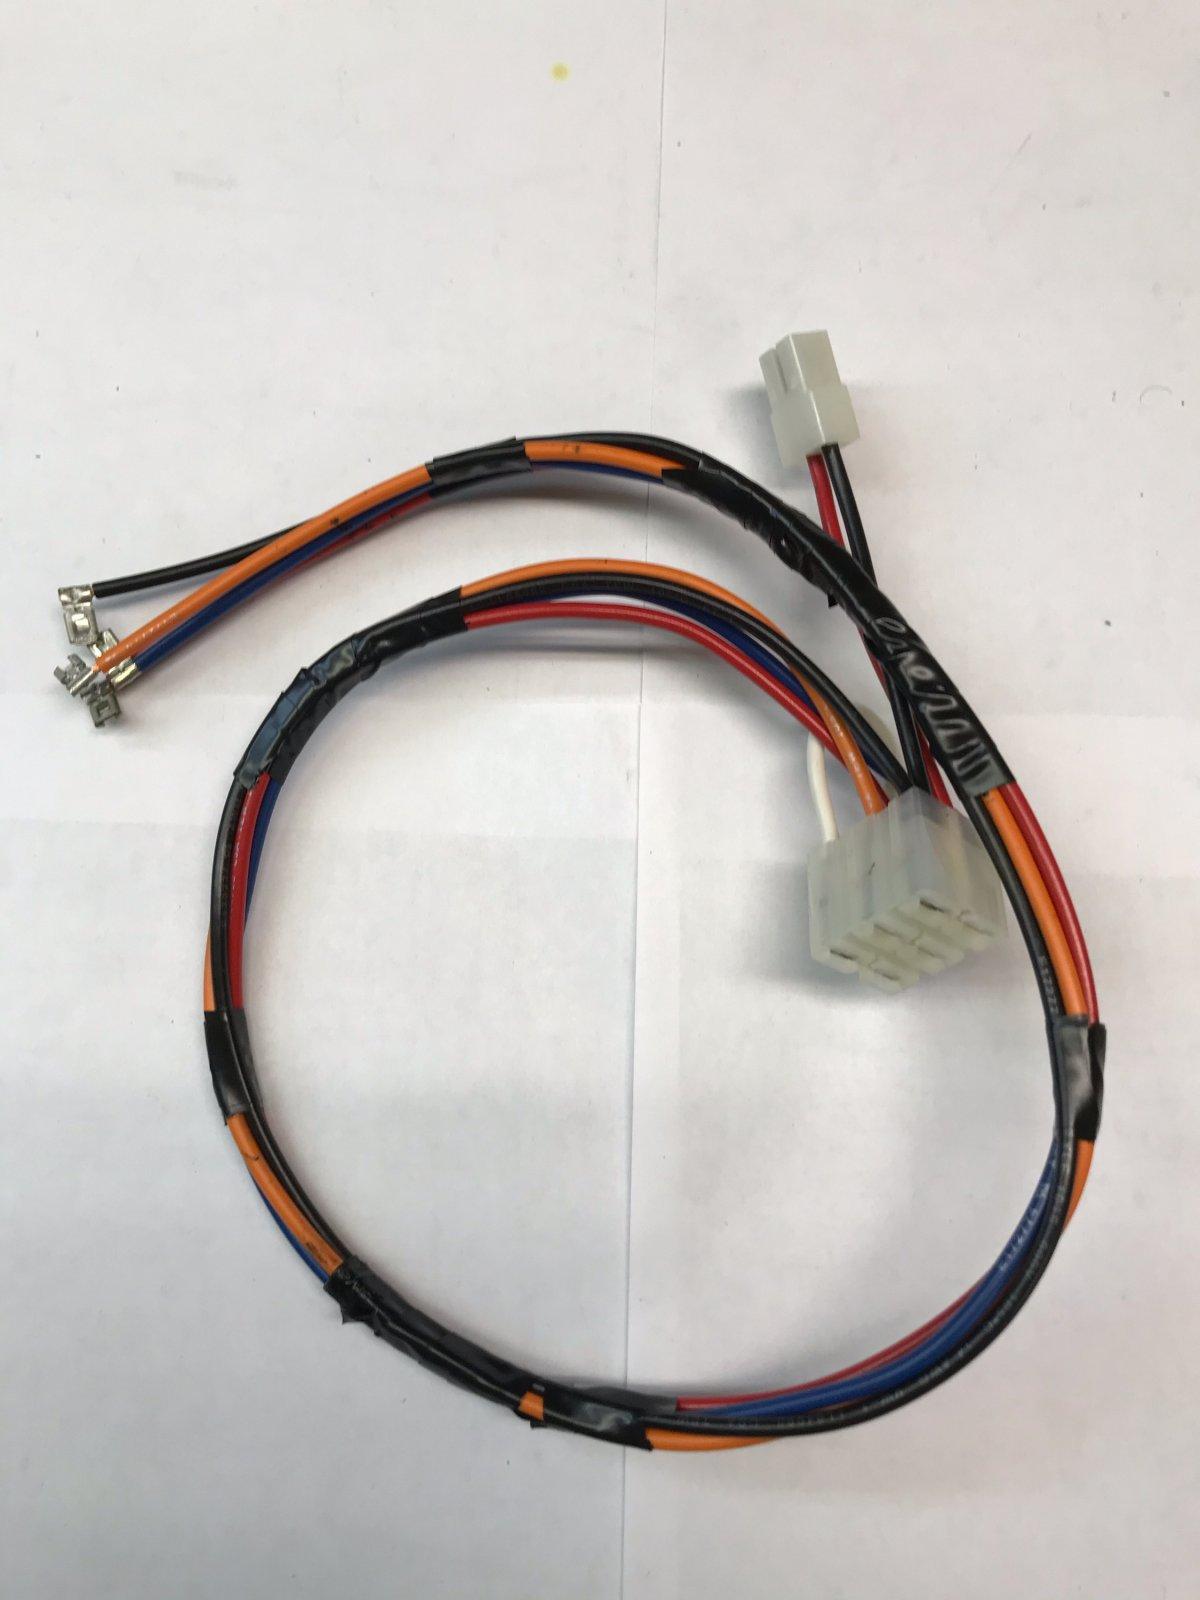 NLA - Quad Wiring Harness